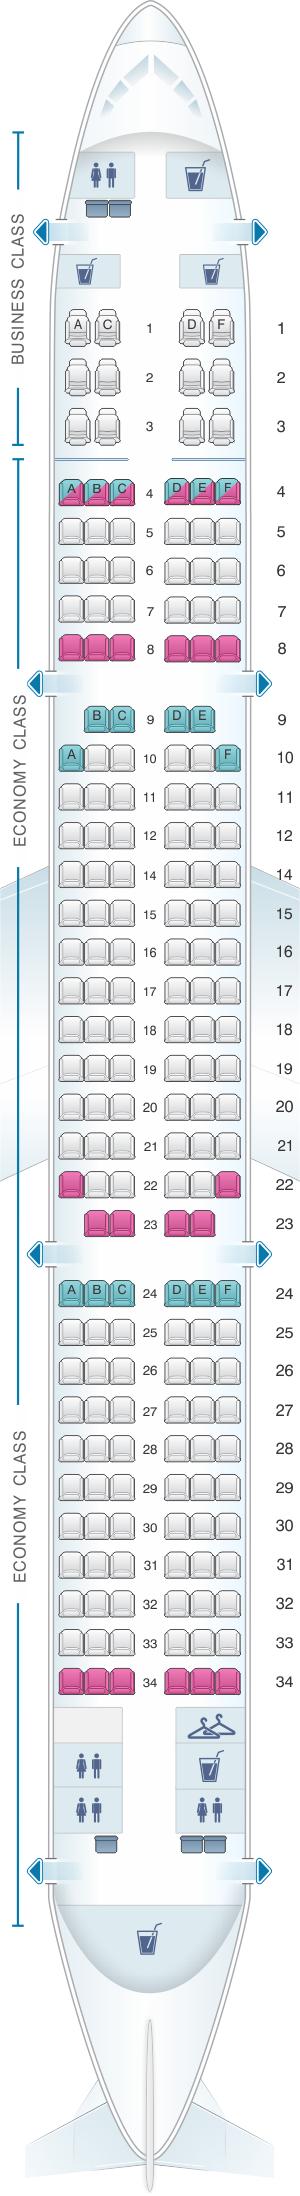 Seat Map Turkish Airlines Airbus A321 200 | SeatMaestro.com